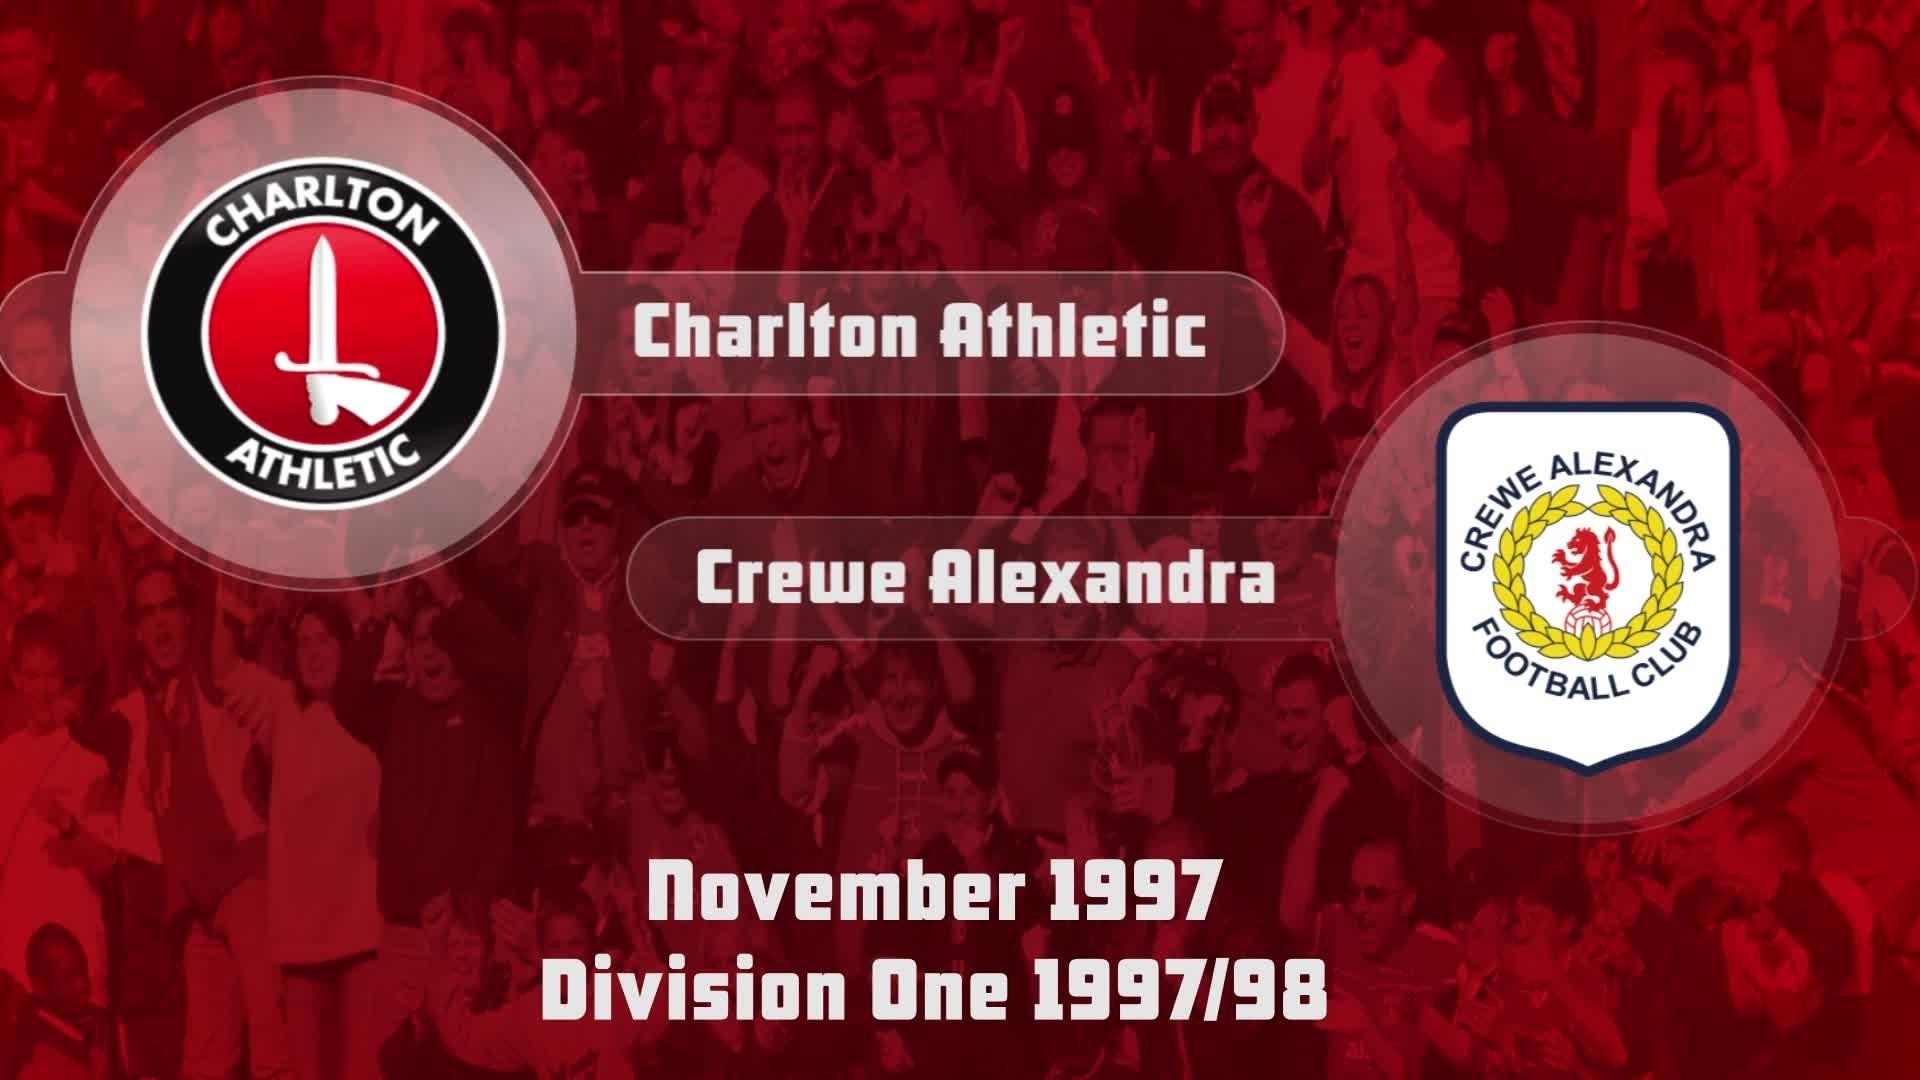 19 HIGHLIGHTS | Charlton 3 Crewe 2 (Nov 1997)